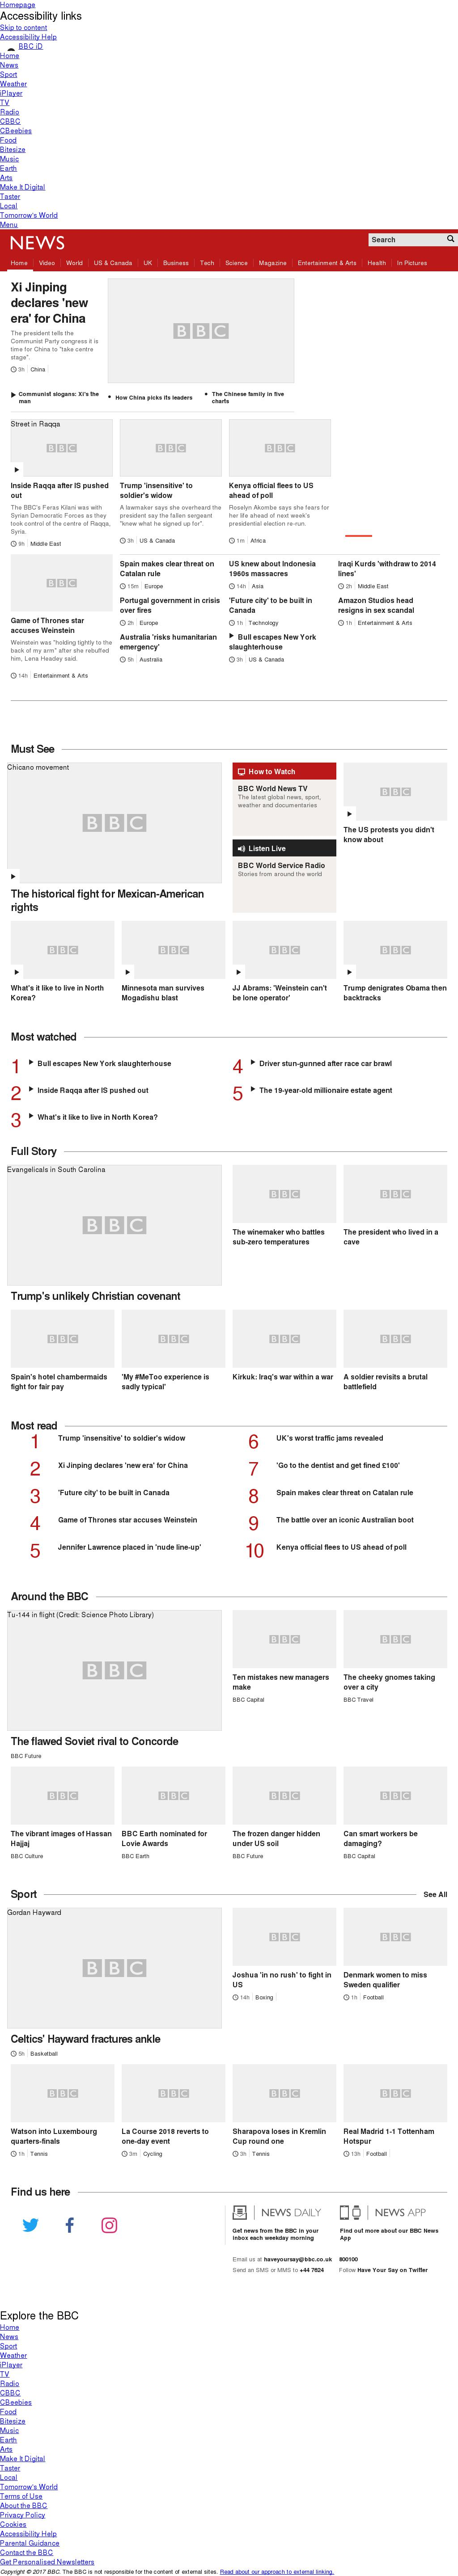 BBC at Wednesday Oct. 18, 2017, noon UTC